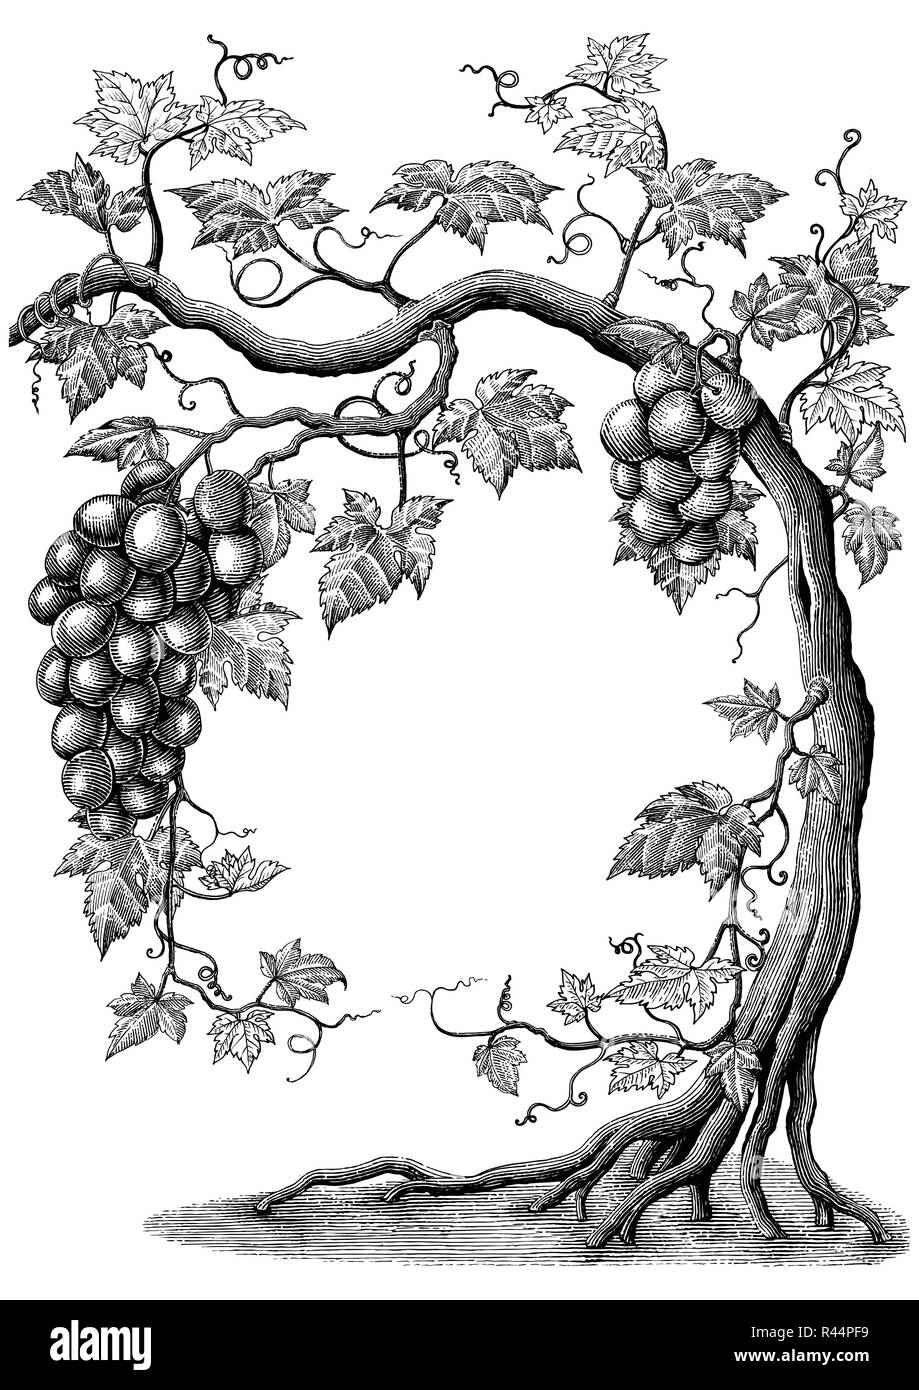 Arbre Genealogique De Raisin Dessin A La Main Vintage Gravure